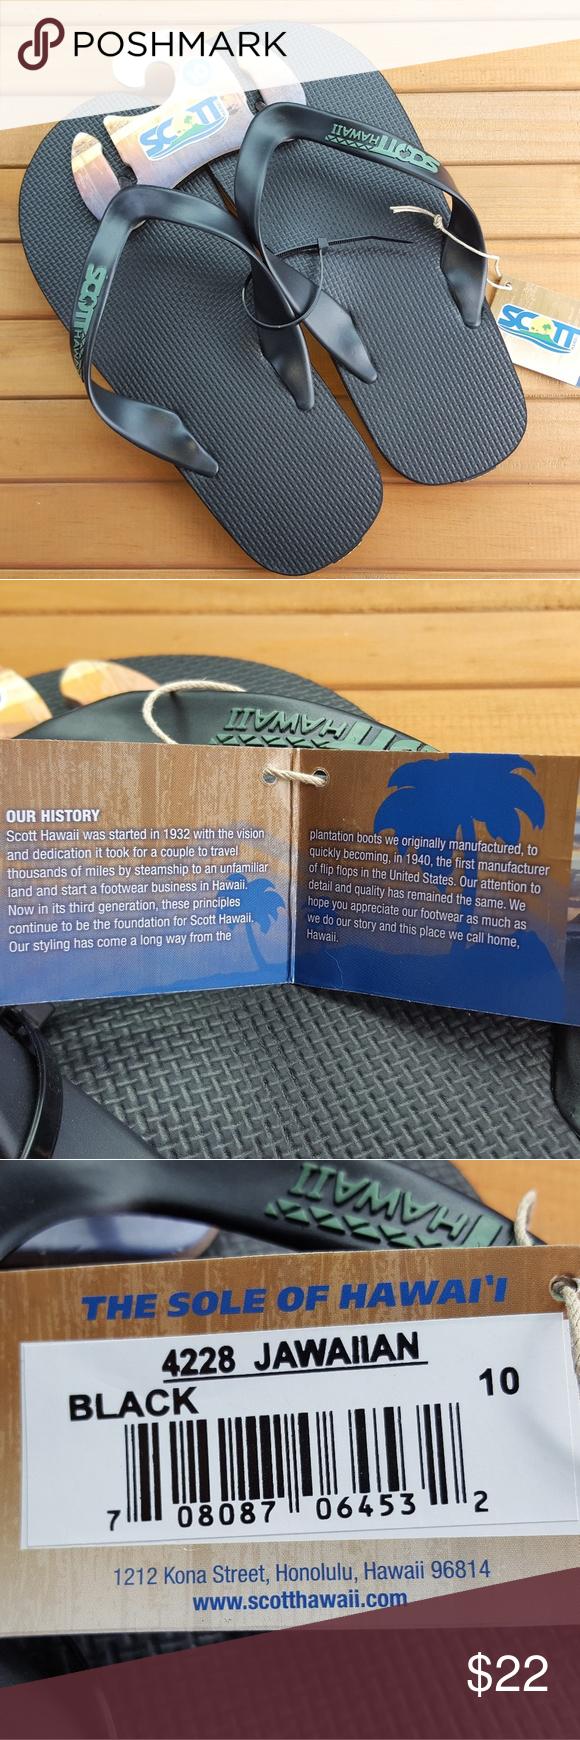 e3ac5b49e253 Scott Hawaii Men s Jawaiian Flip-Flops Summer is coming! Perfect for the  surfer or